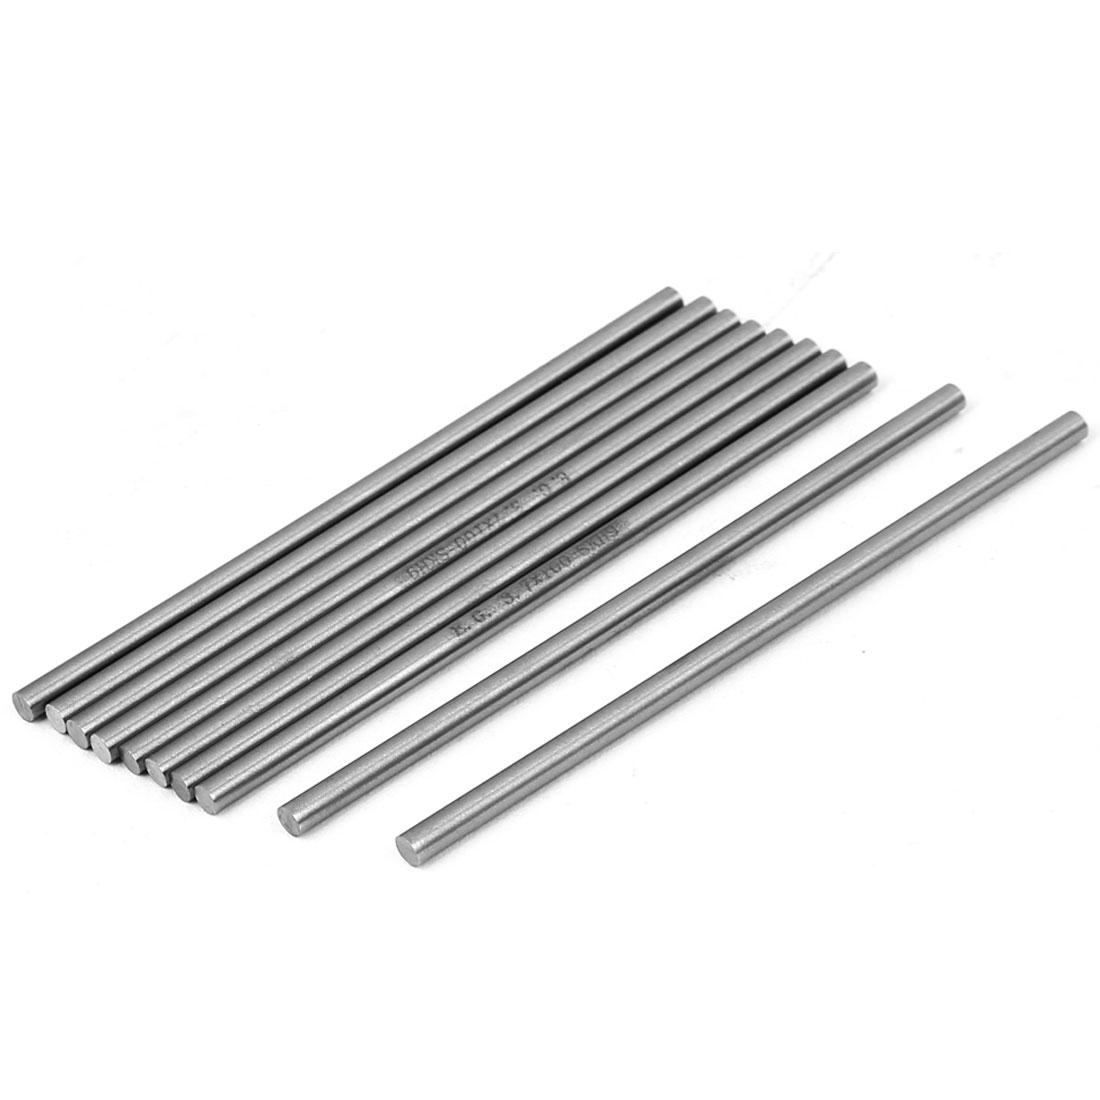 3.7mm x 100mm HSS Straight Machine Turning Tool Round Lathe Bar Rod Stick 10pcs